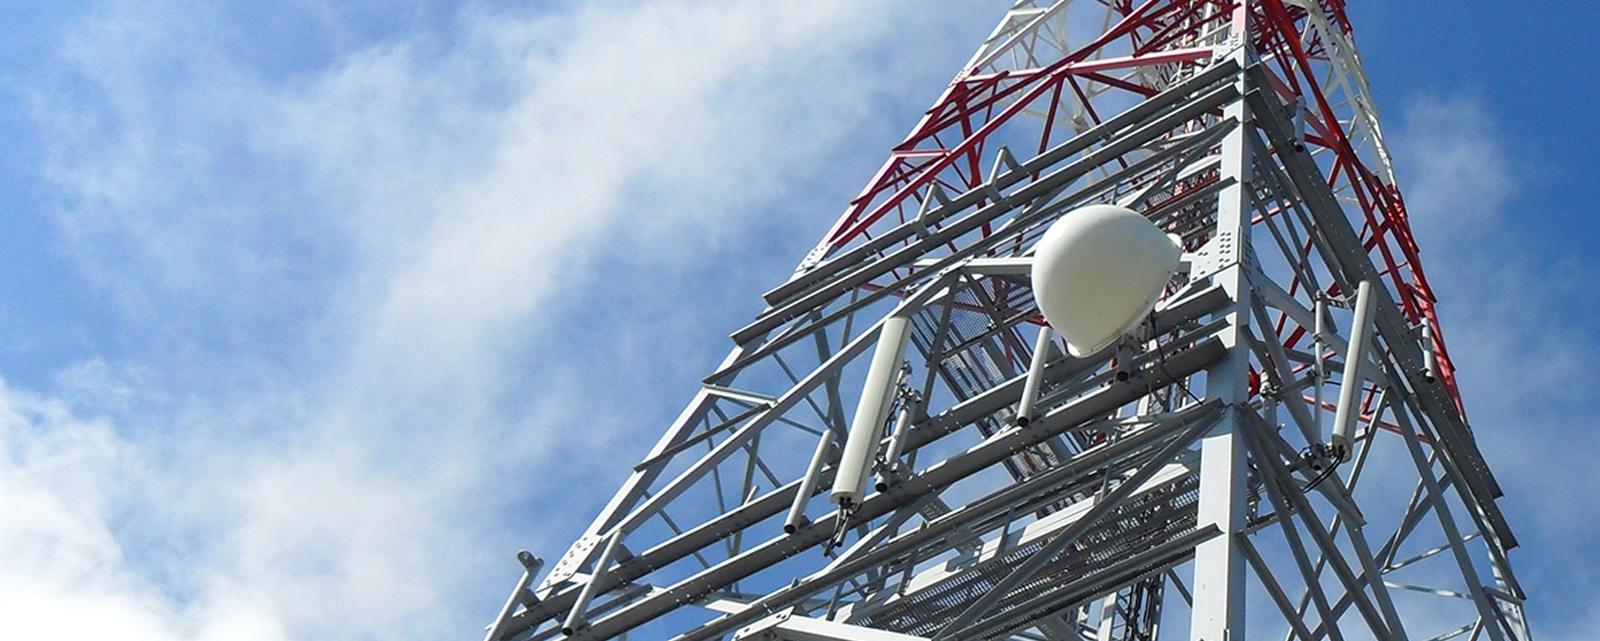 pylon_telecom